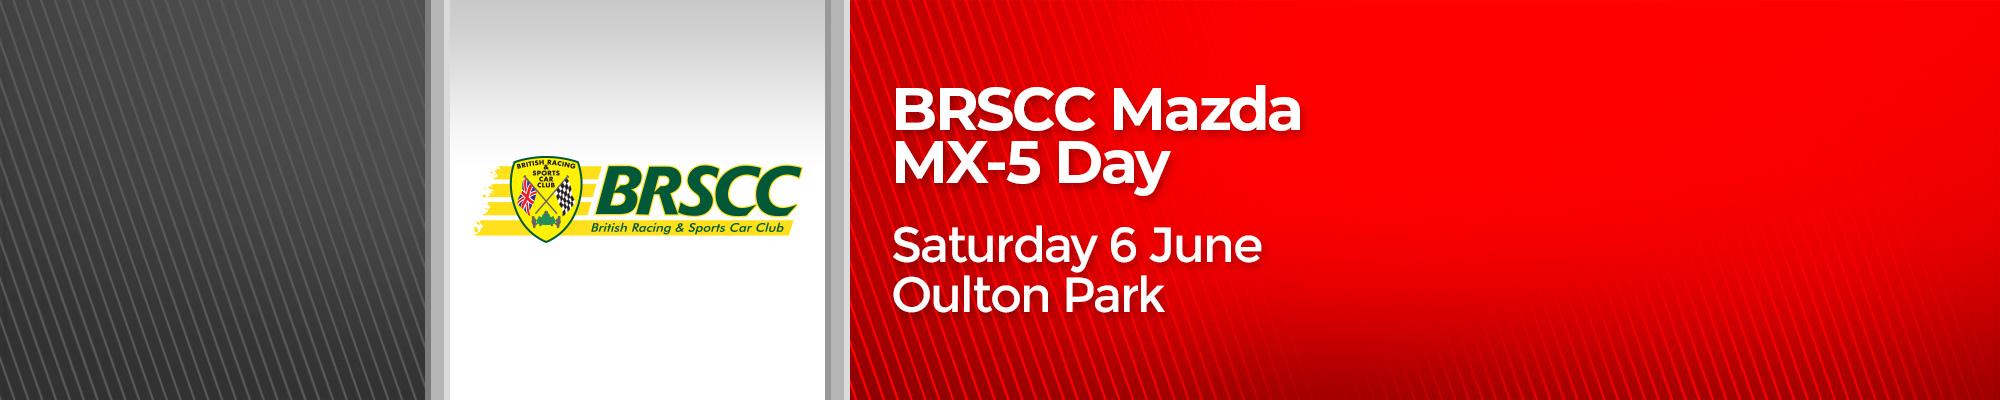 BRSCC Club Car Championships - POSTPONED